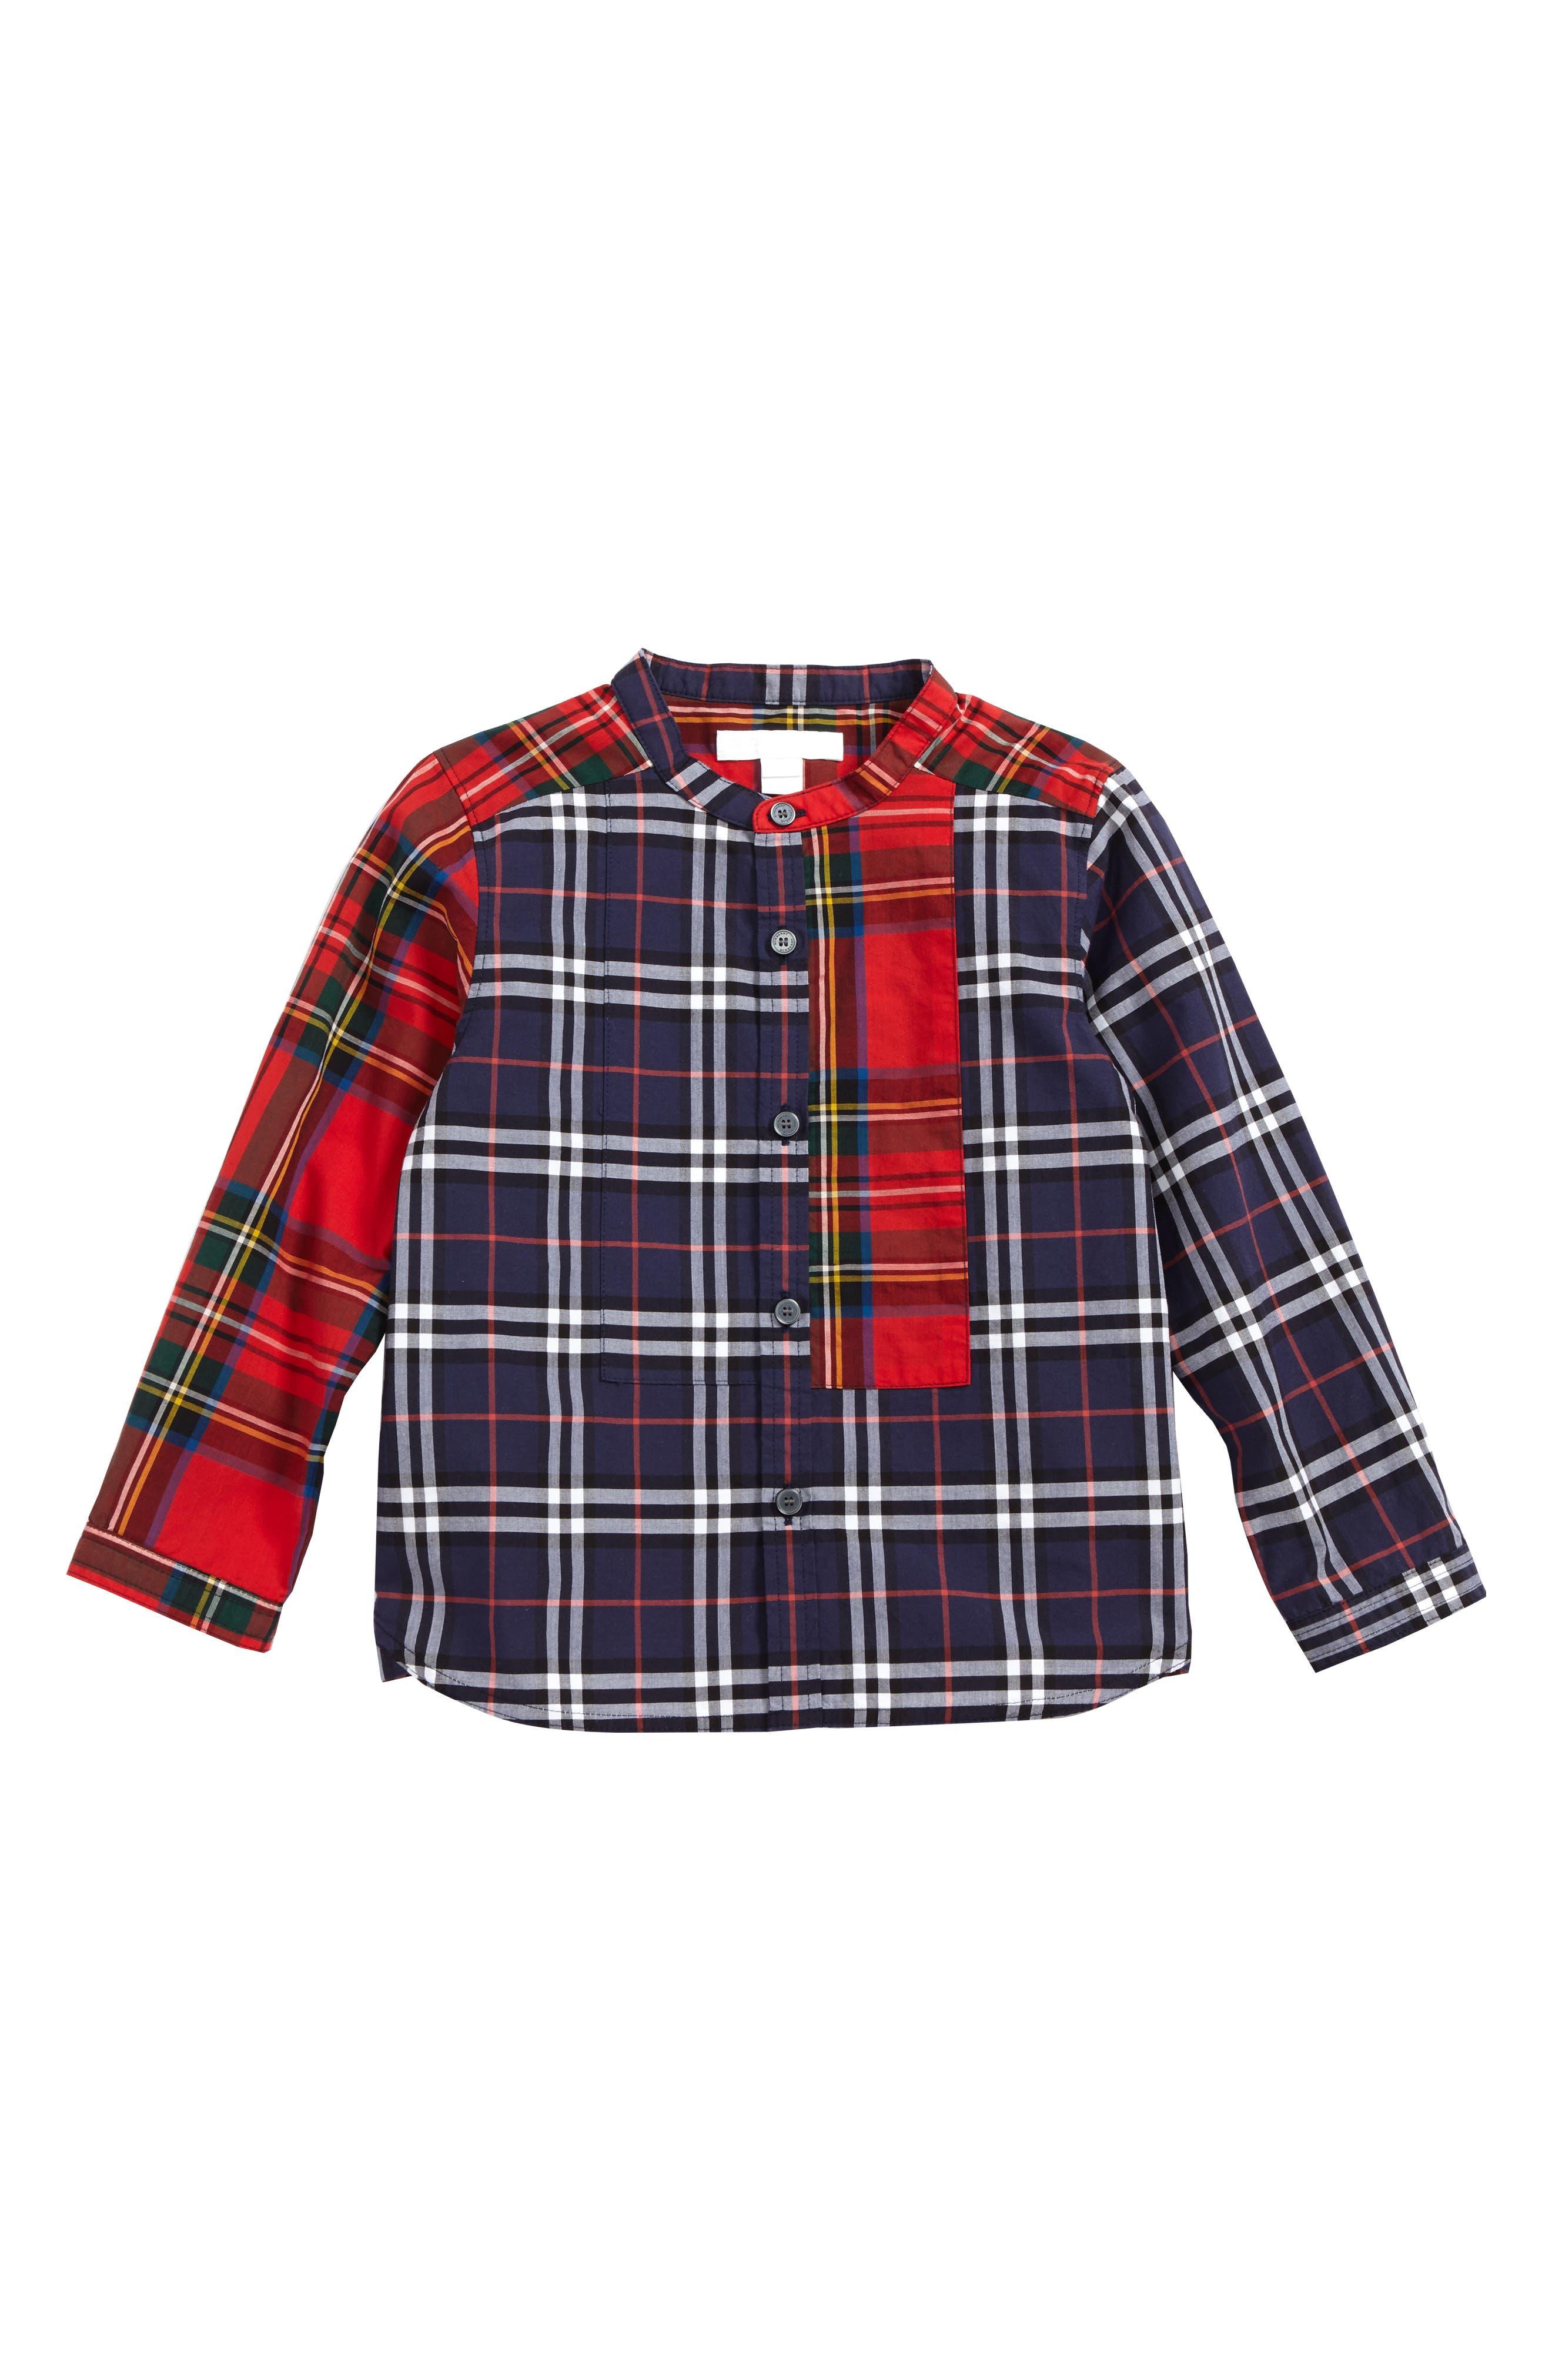 Main Image - Burberry Argus Check Print Woven Shirt (Toddler Boys, Little Boys & Big Boys)